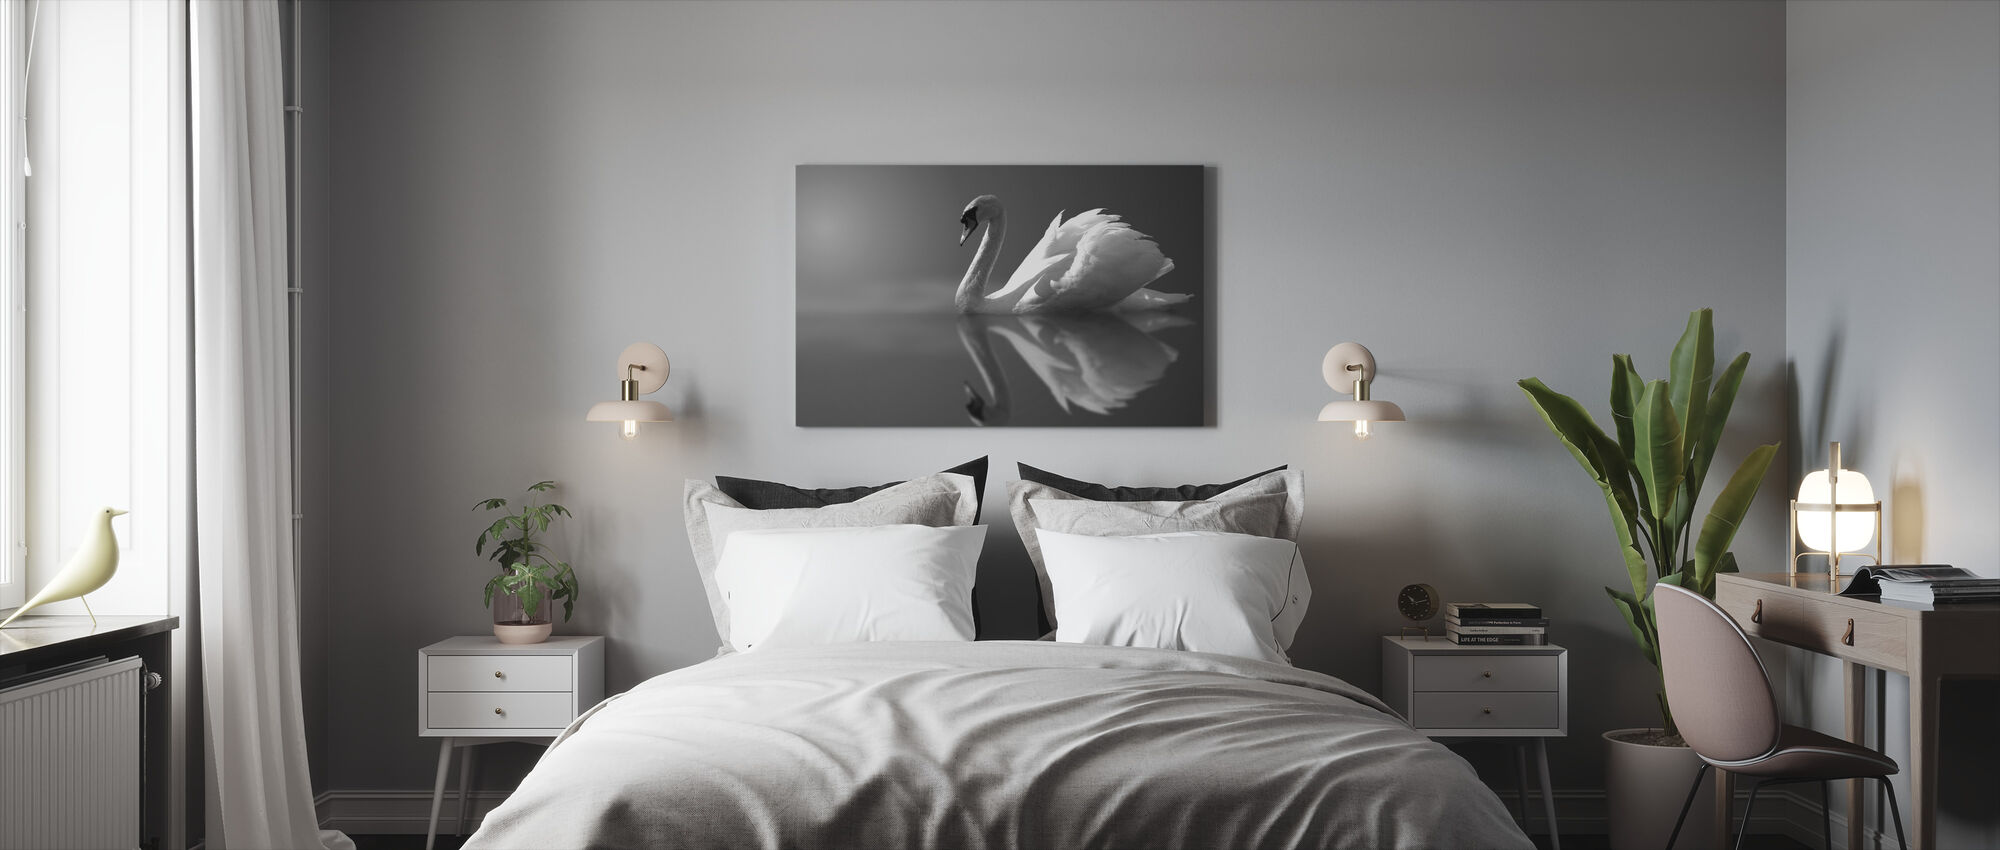 Swan Reflection - Canvas print - Bedroom